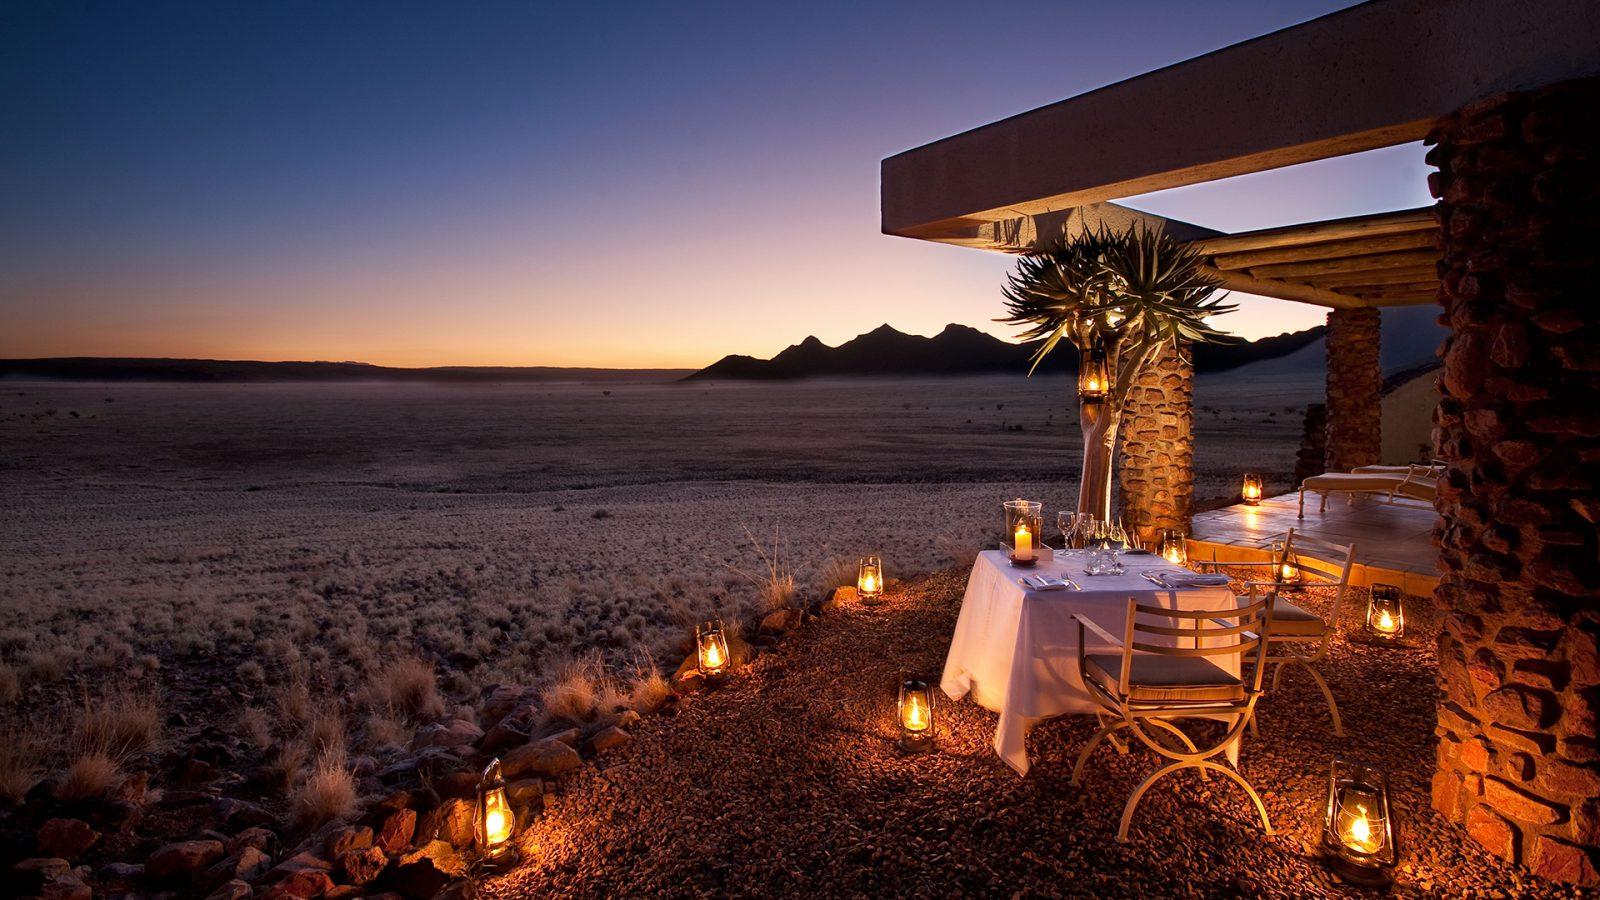 8.Namibia, Africa